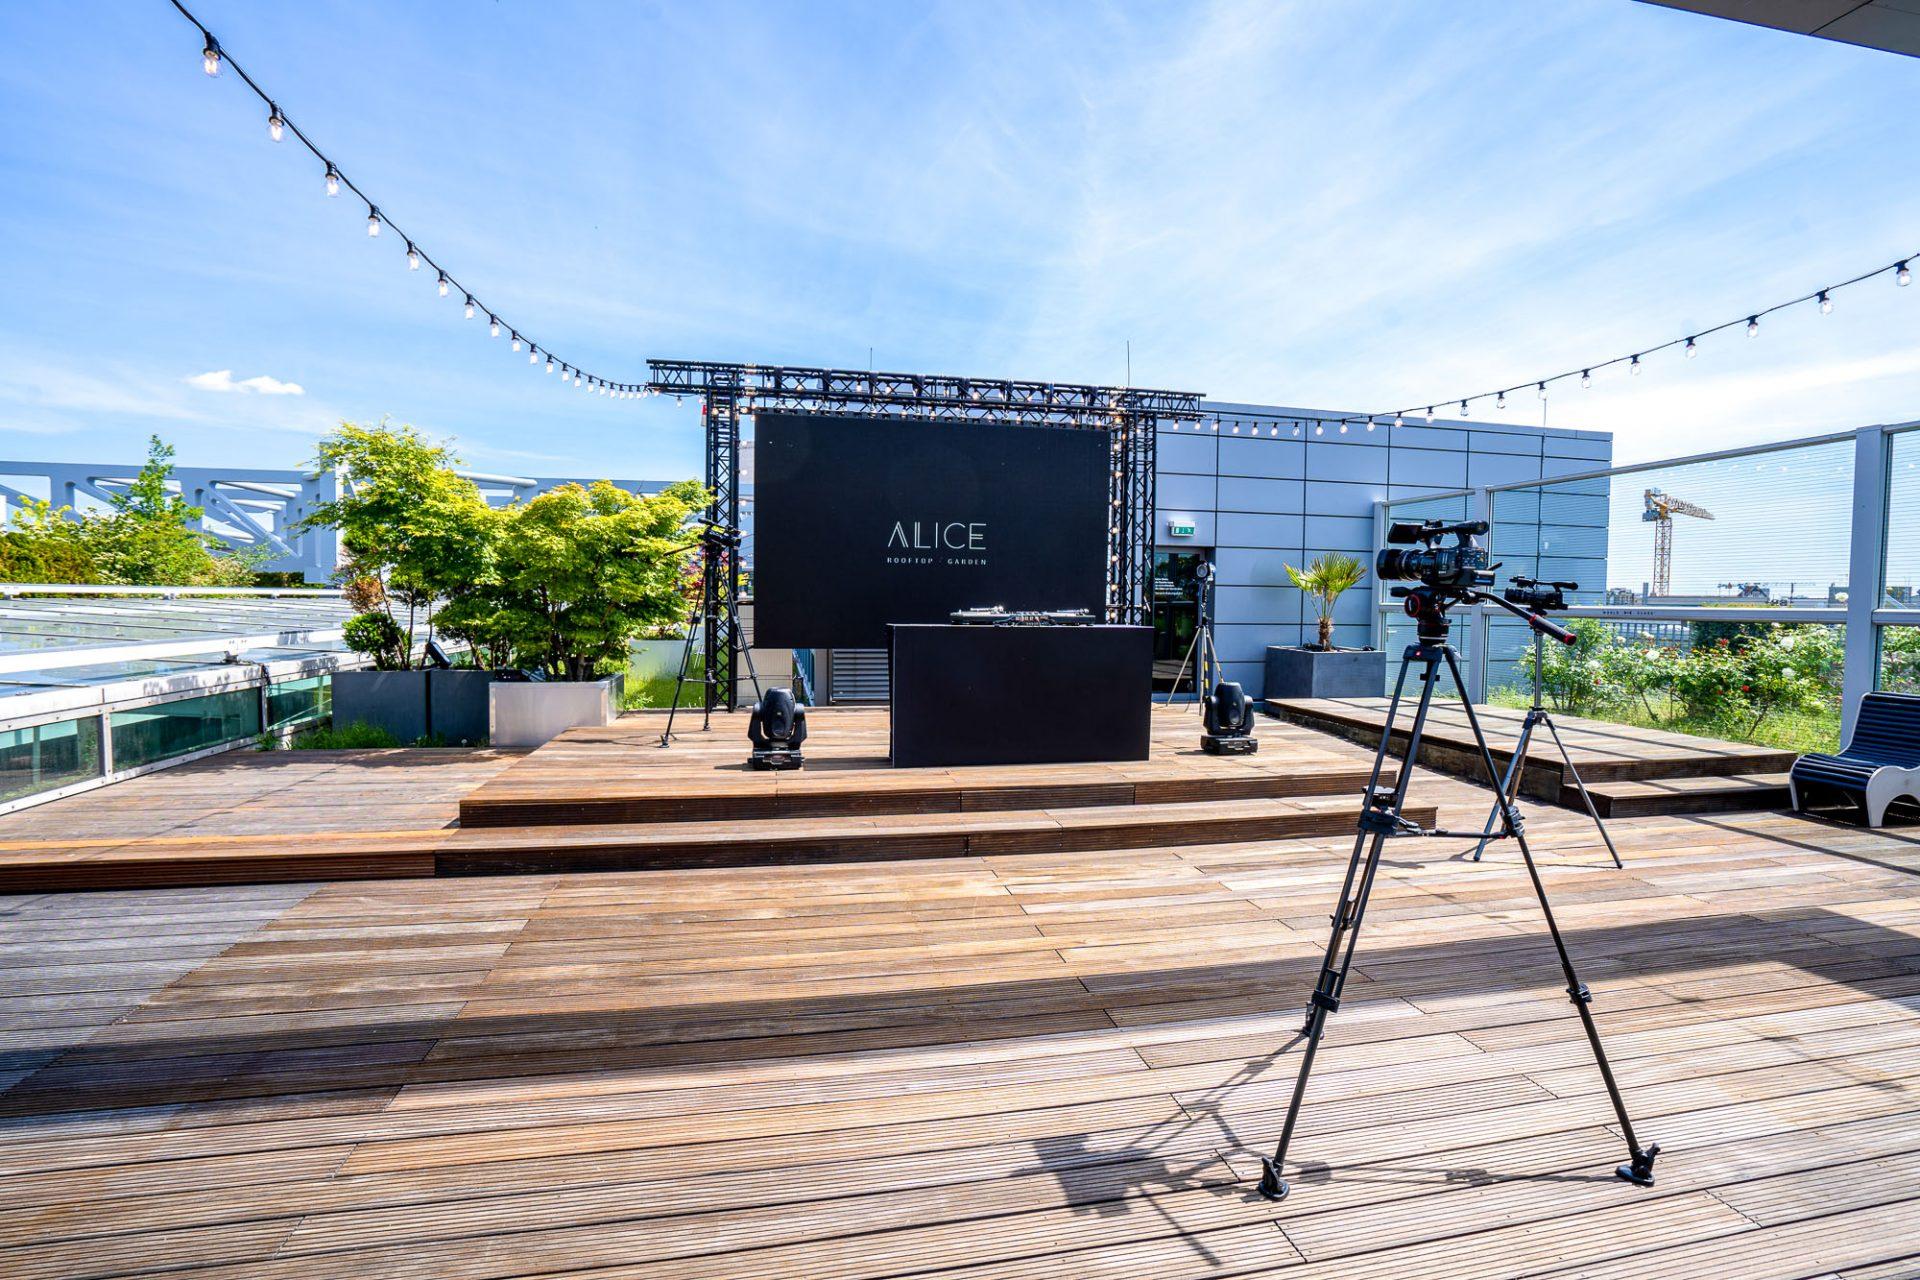 Hybrid Events mit Live-Streaming: Eventlocation Alice Rooftop & Garden Location in Berlin